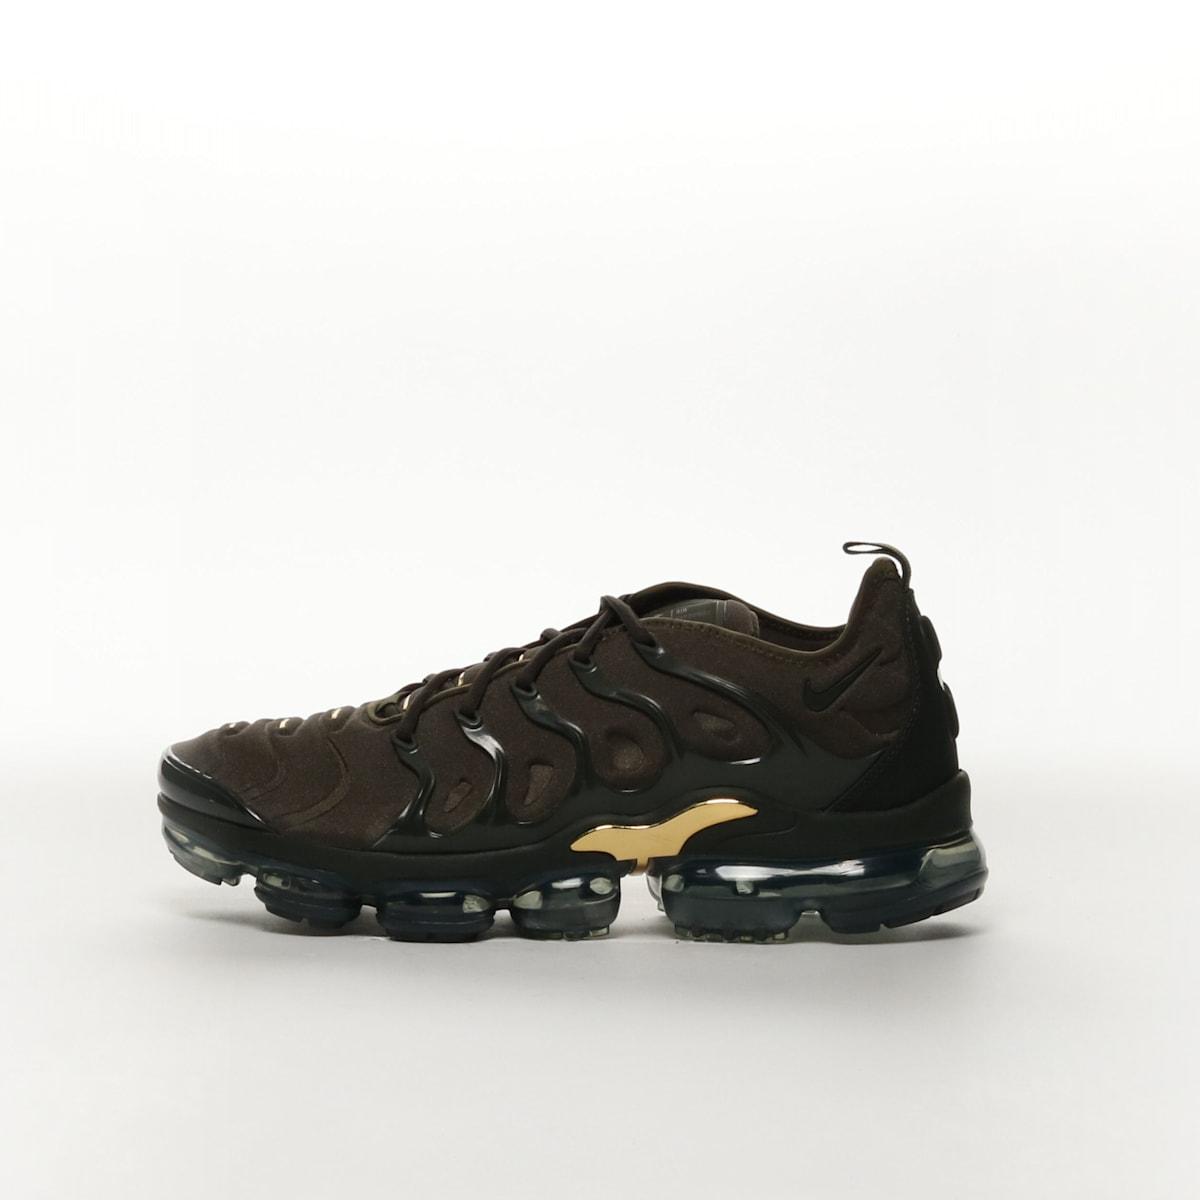 a1c4031a58 Nike Air VaporMax Plus - CARGO KHAKI/CLAY GREEN/METALLIC GOLD ...